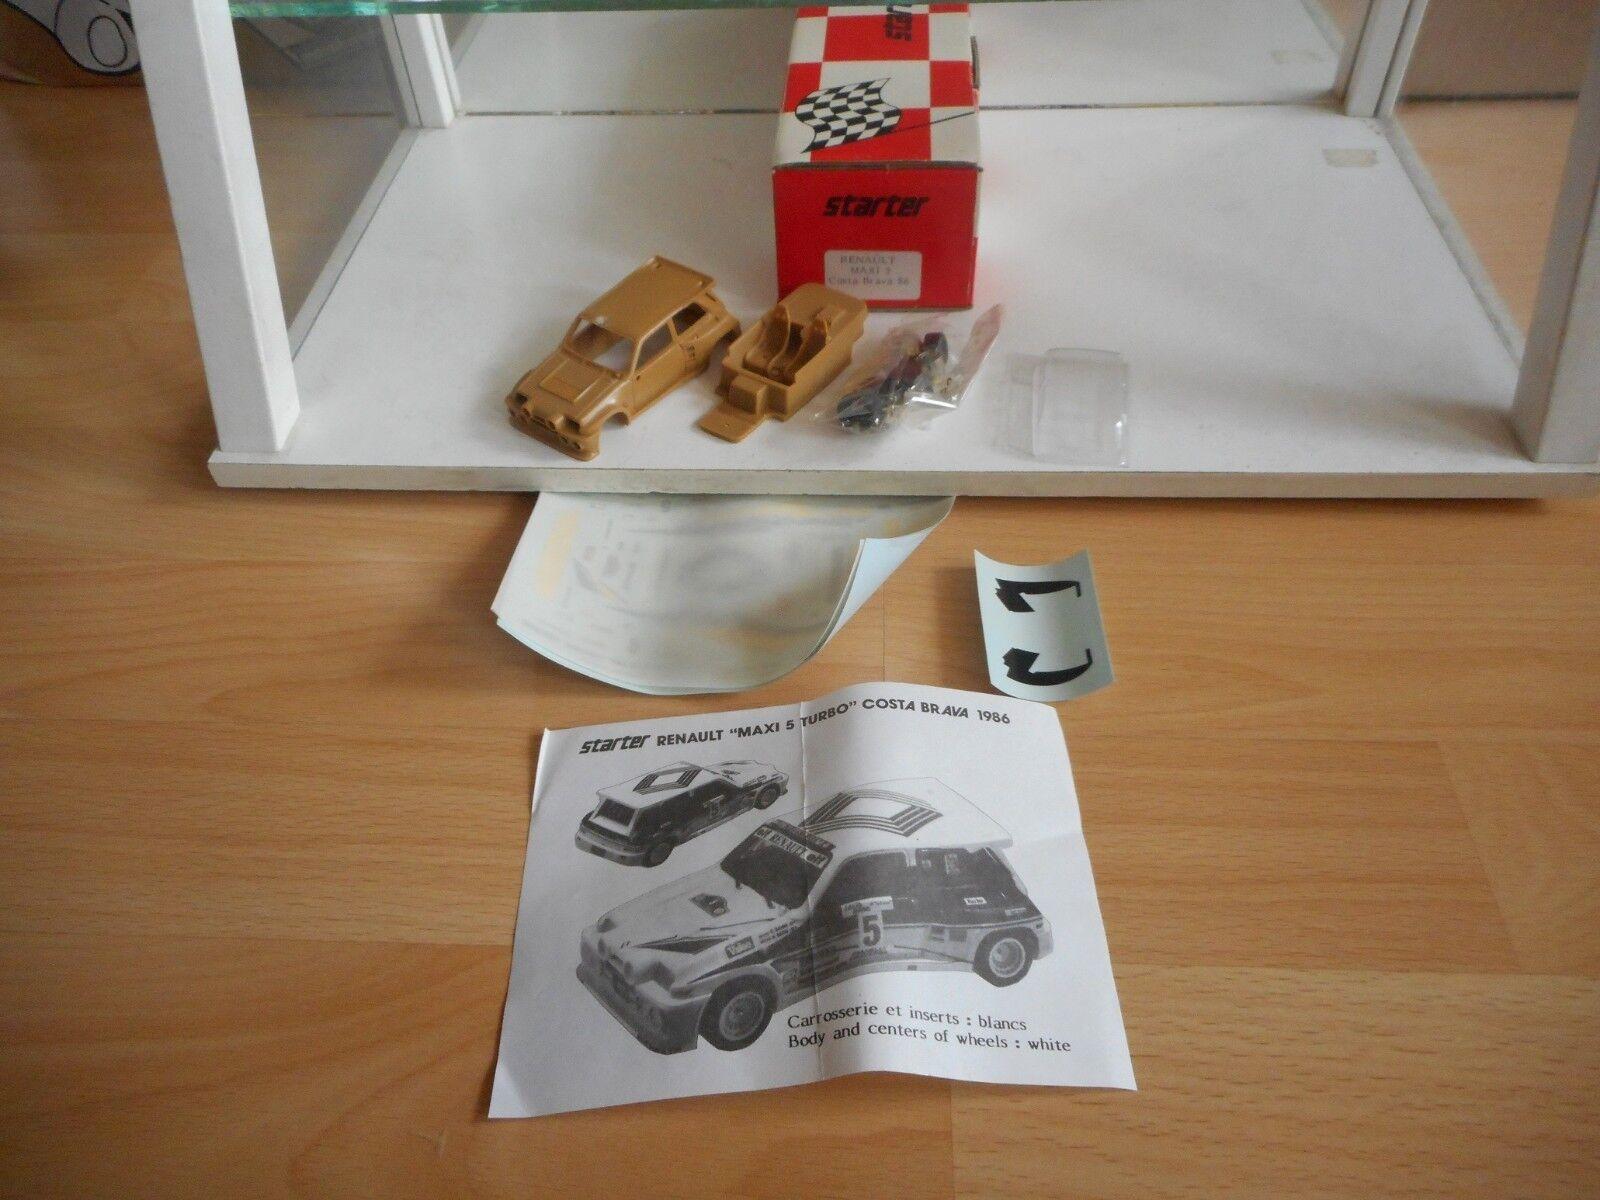 Resin Modelkit Starter Renault Maxi 5 Costa Brava 86 on 1 43 in Box